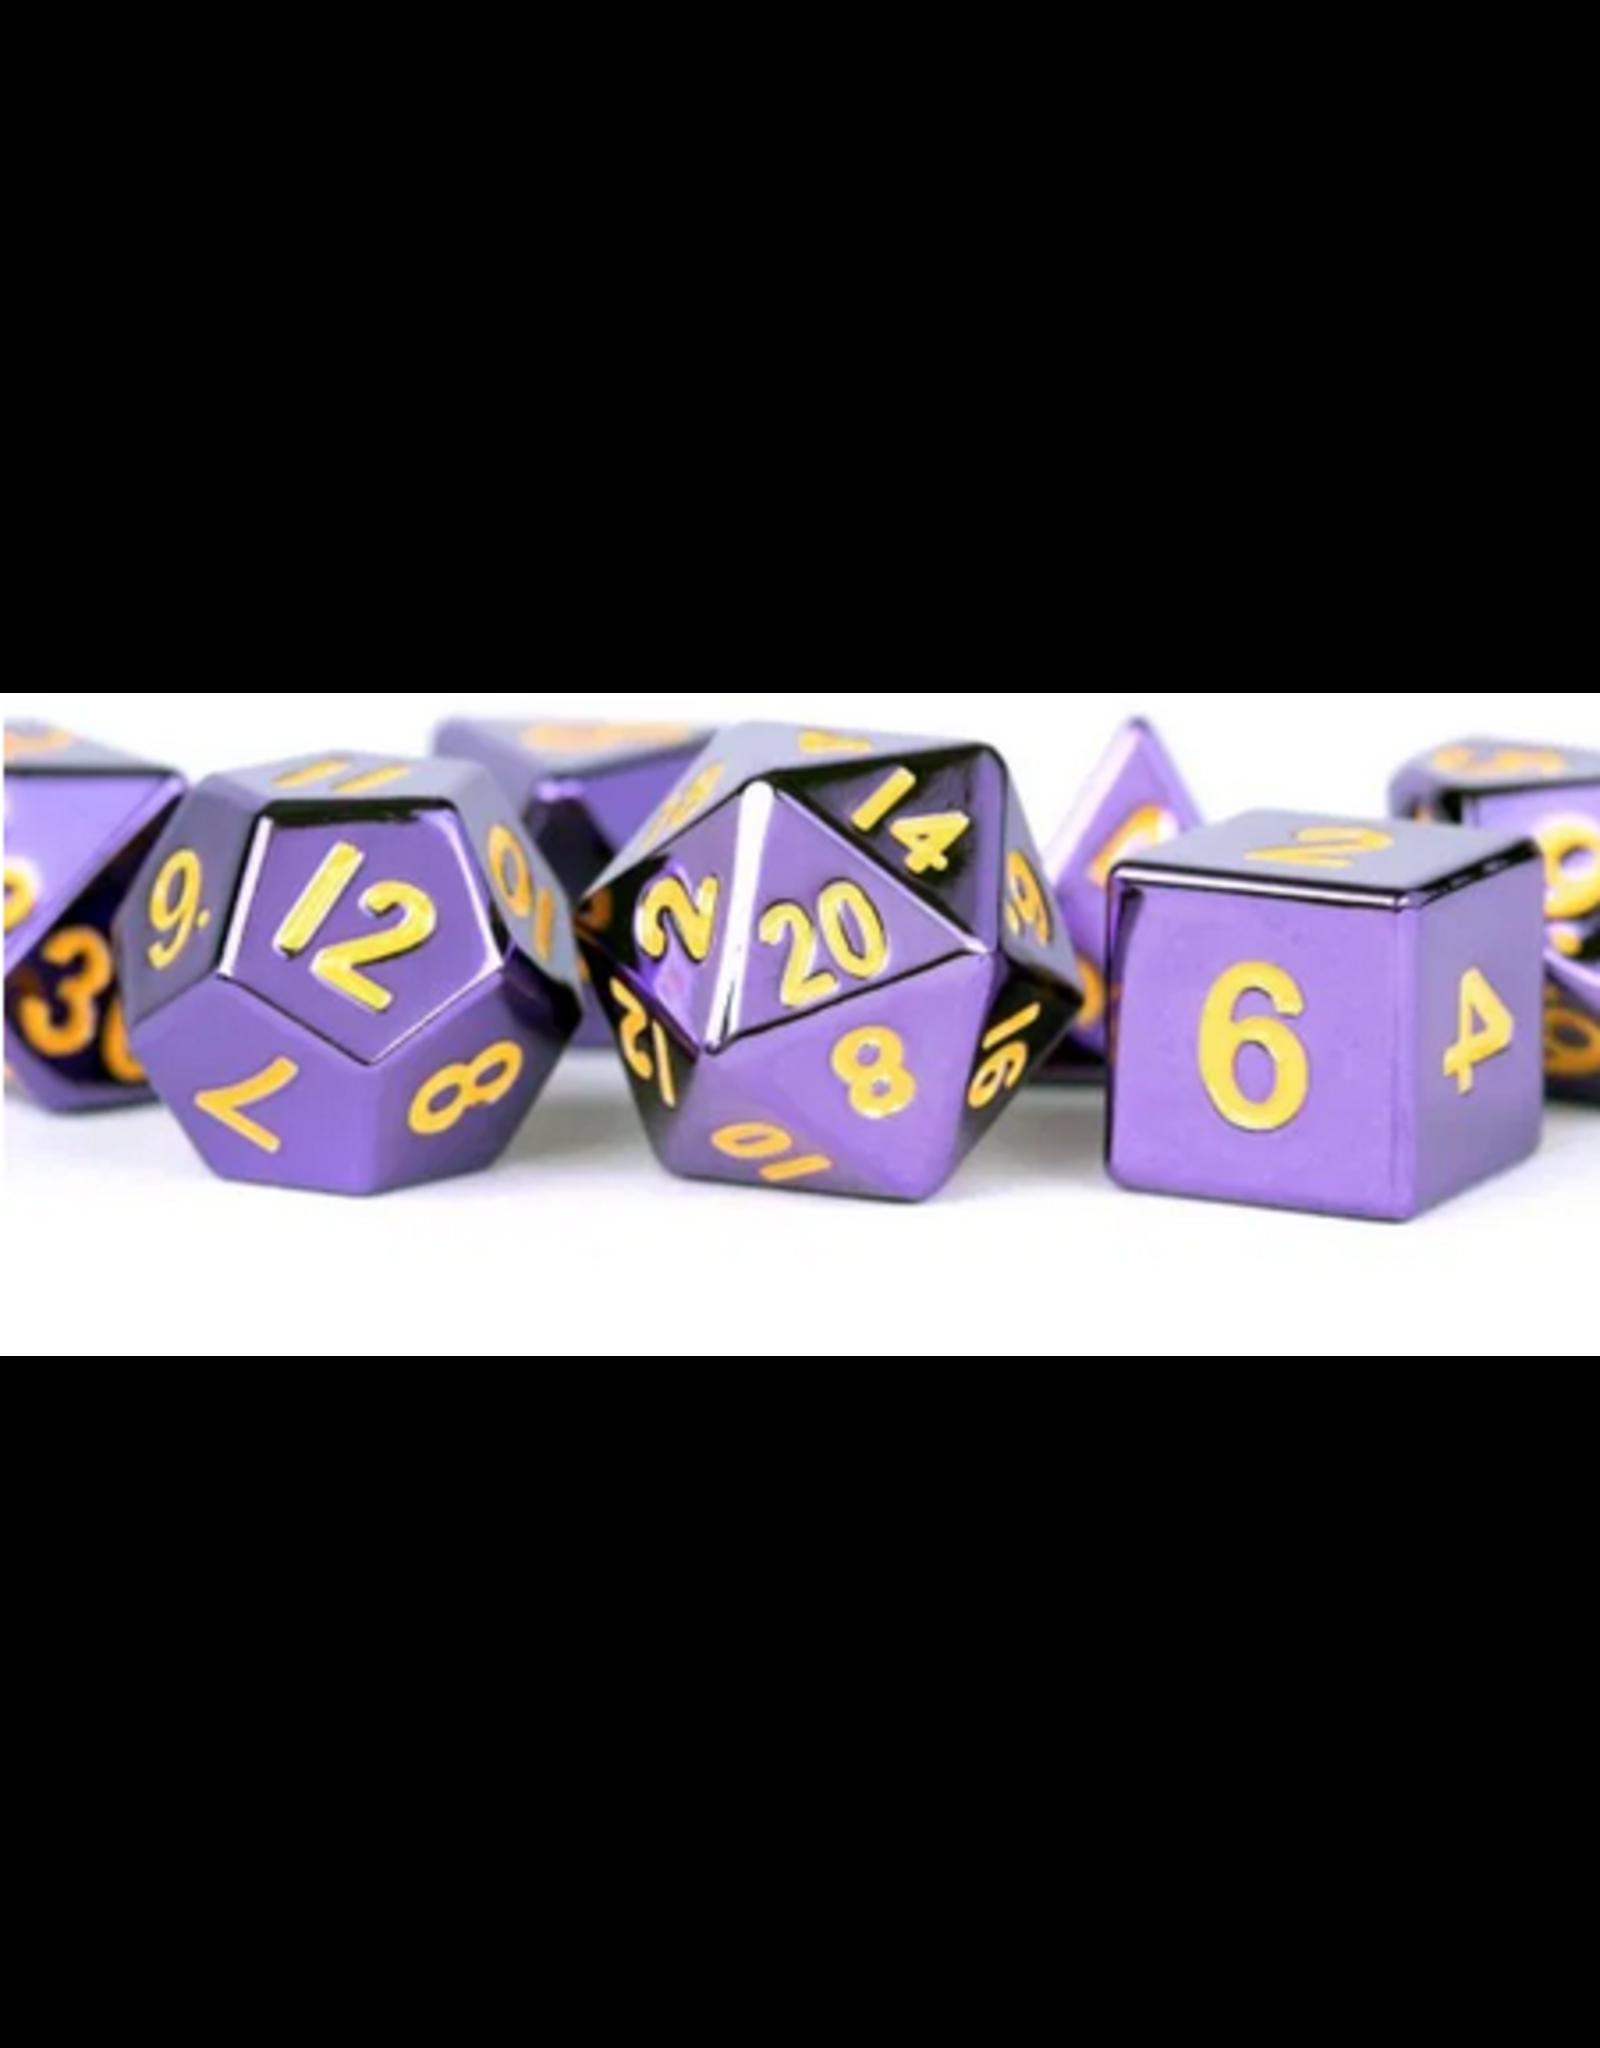 Dice 16mm Purple Painted Metal Polyhedral Dice Set